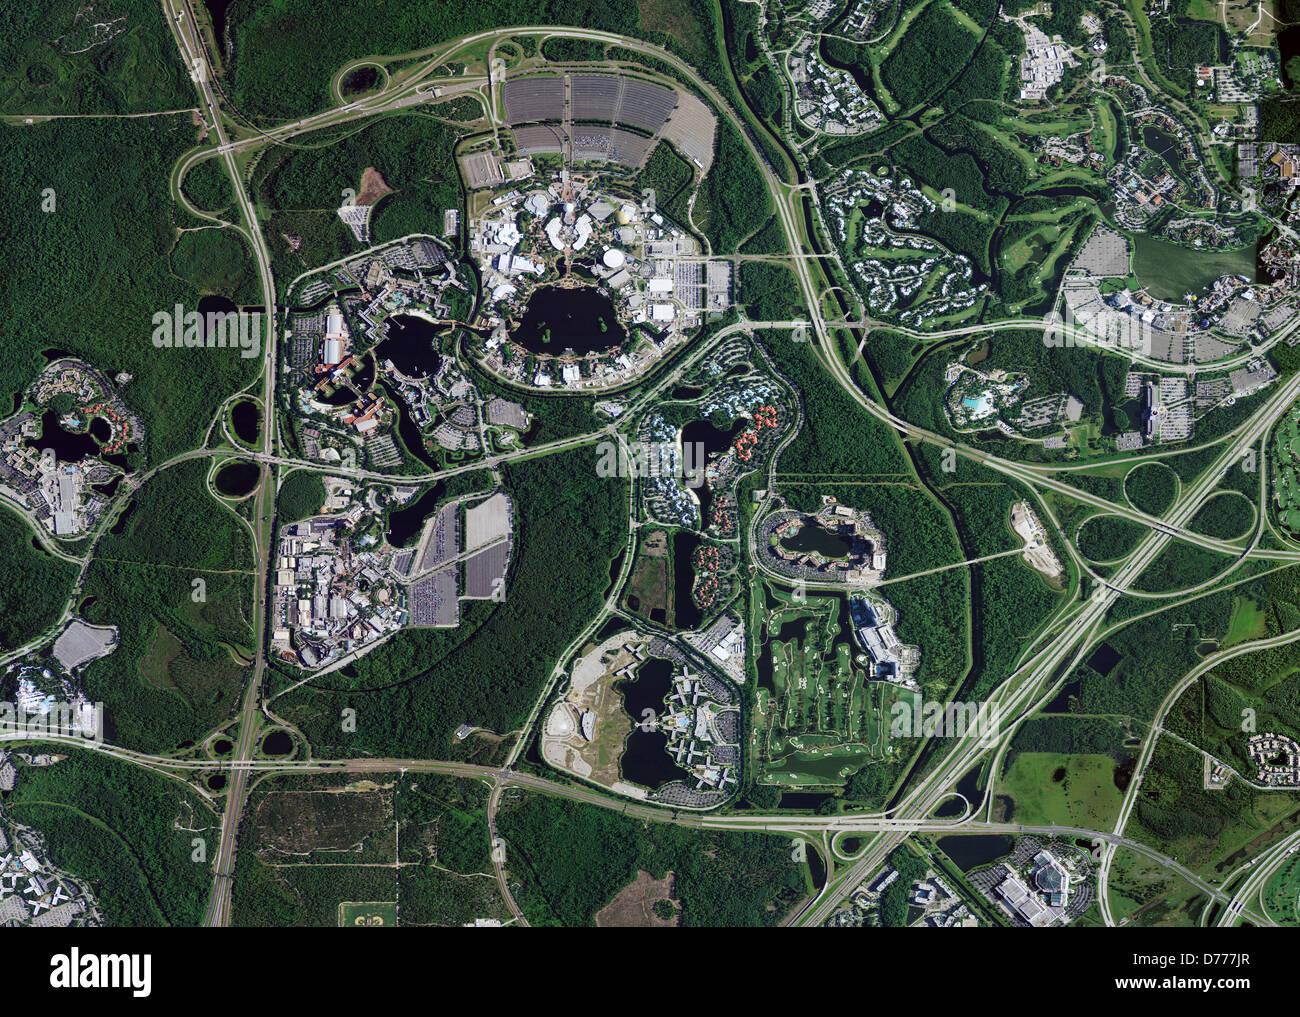 Disney World Florida Map.Aerial Photo Map Of Walt Disney World Lake Buena Vista Florida